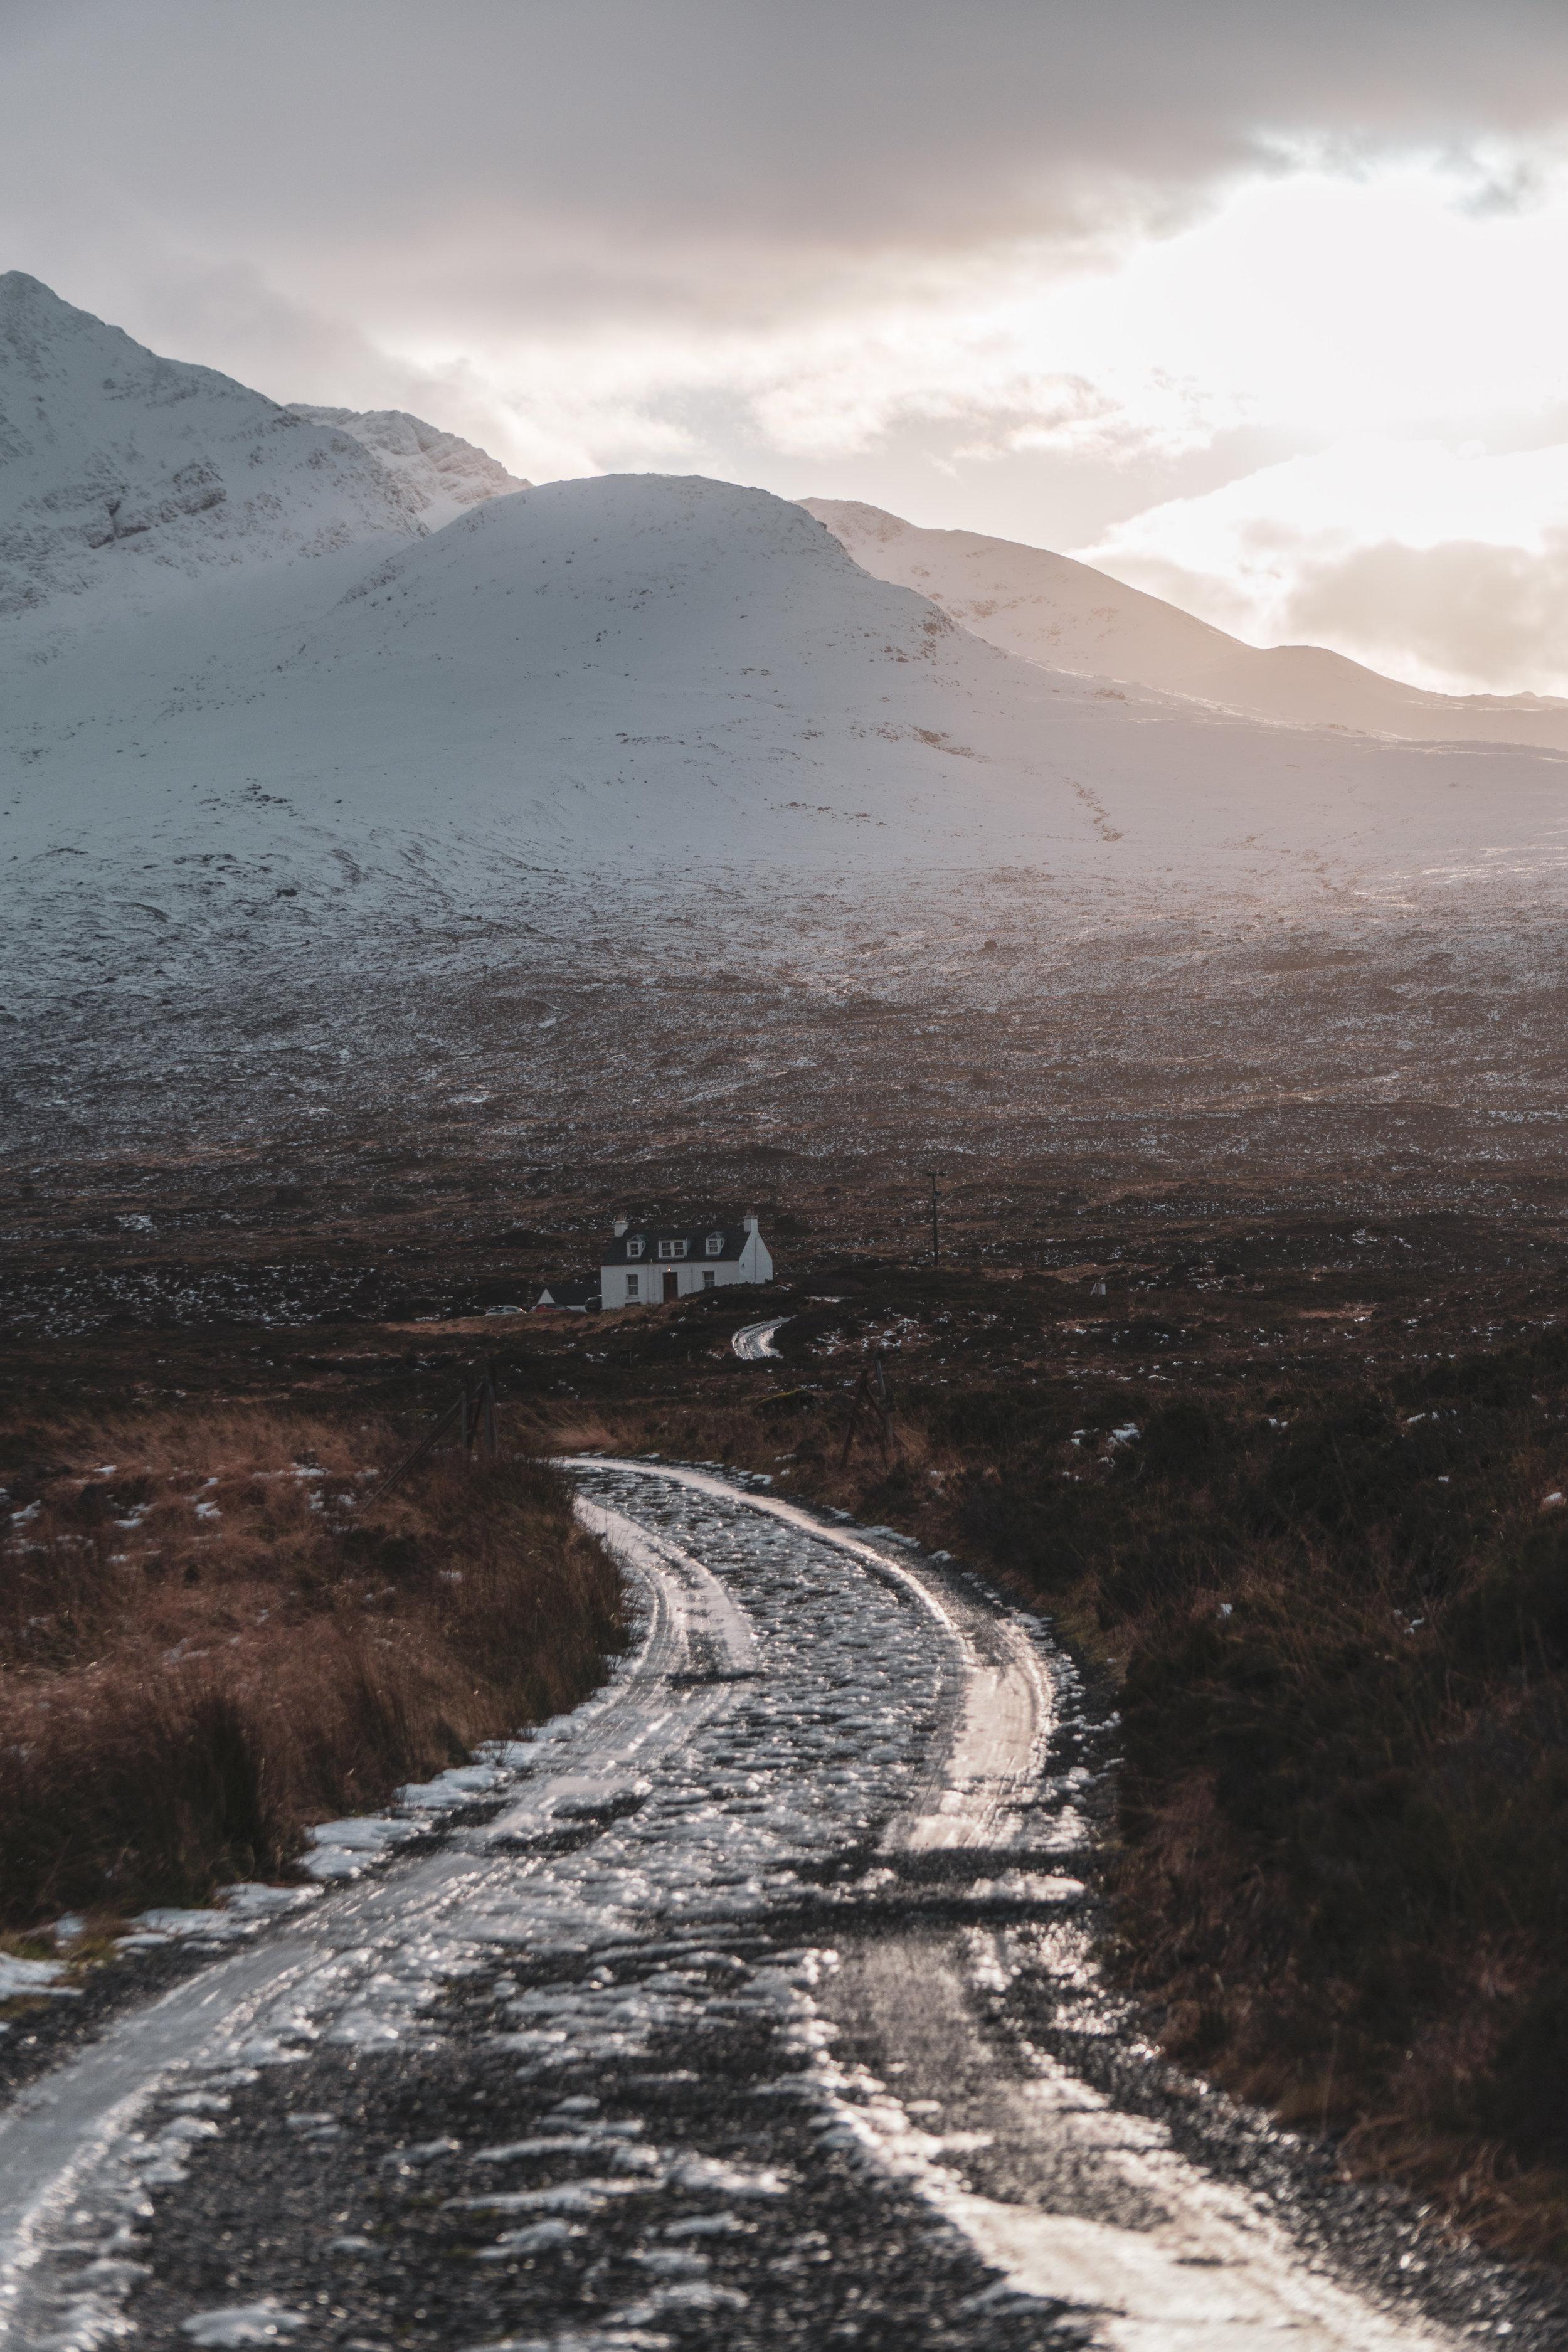 Isle-of-Skye-Fairy-Glen-und-Braes (34).jpg